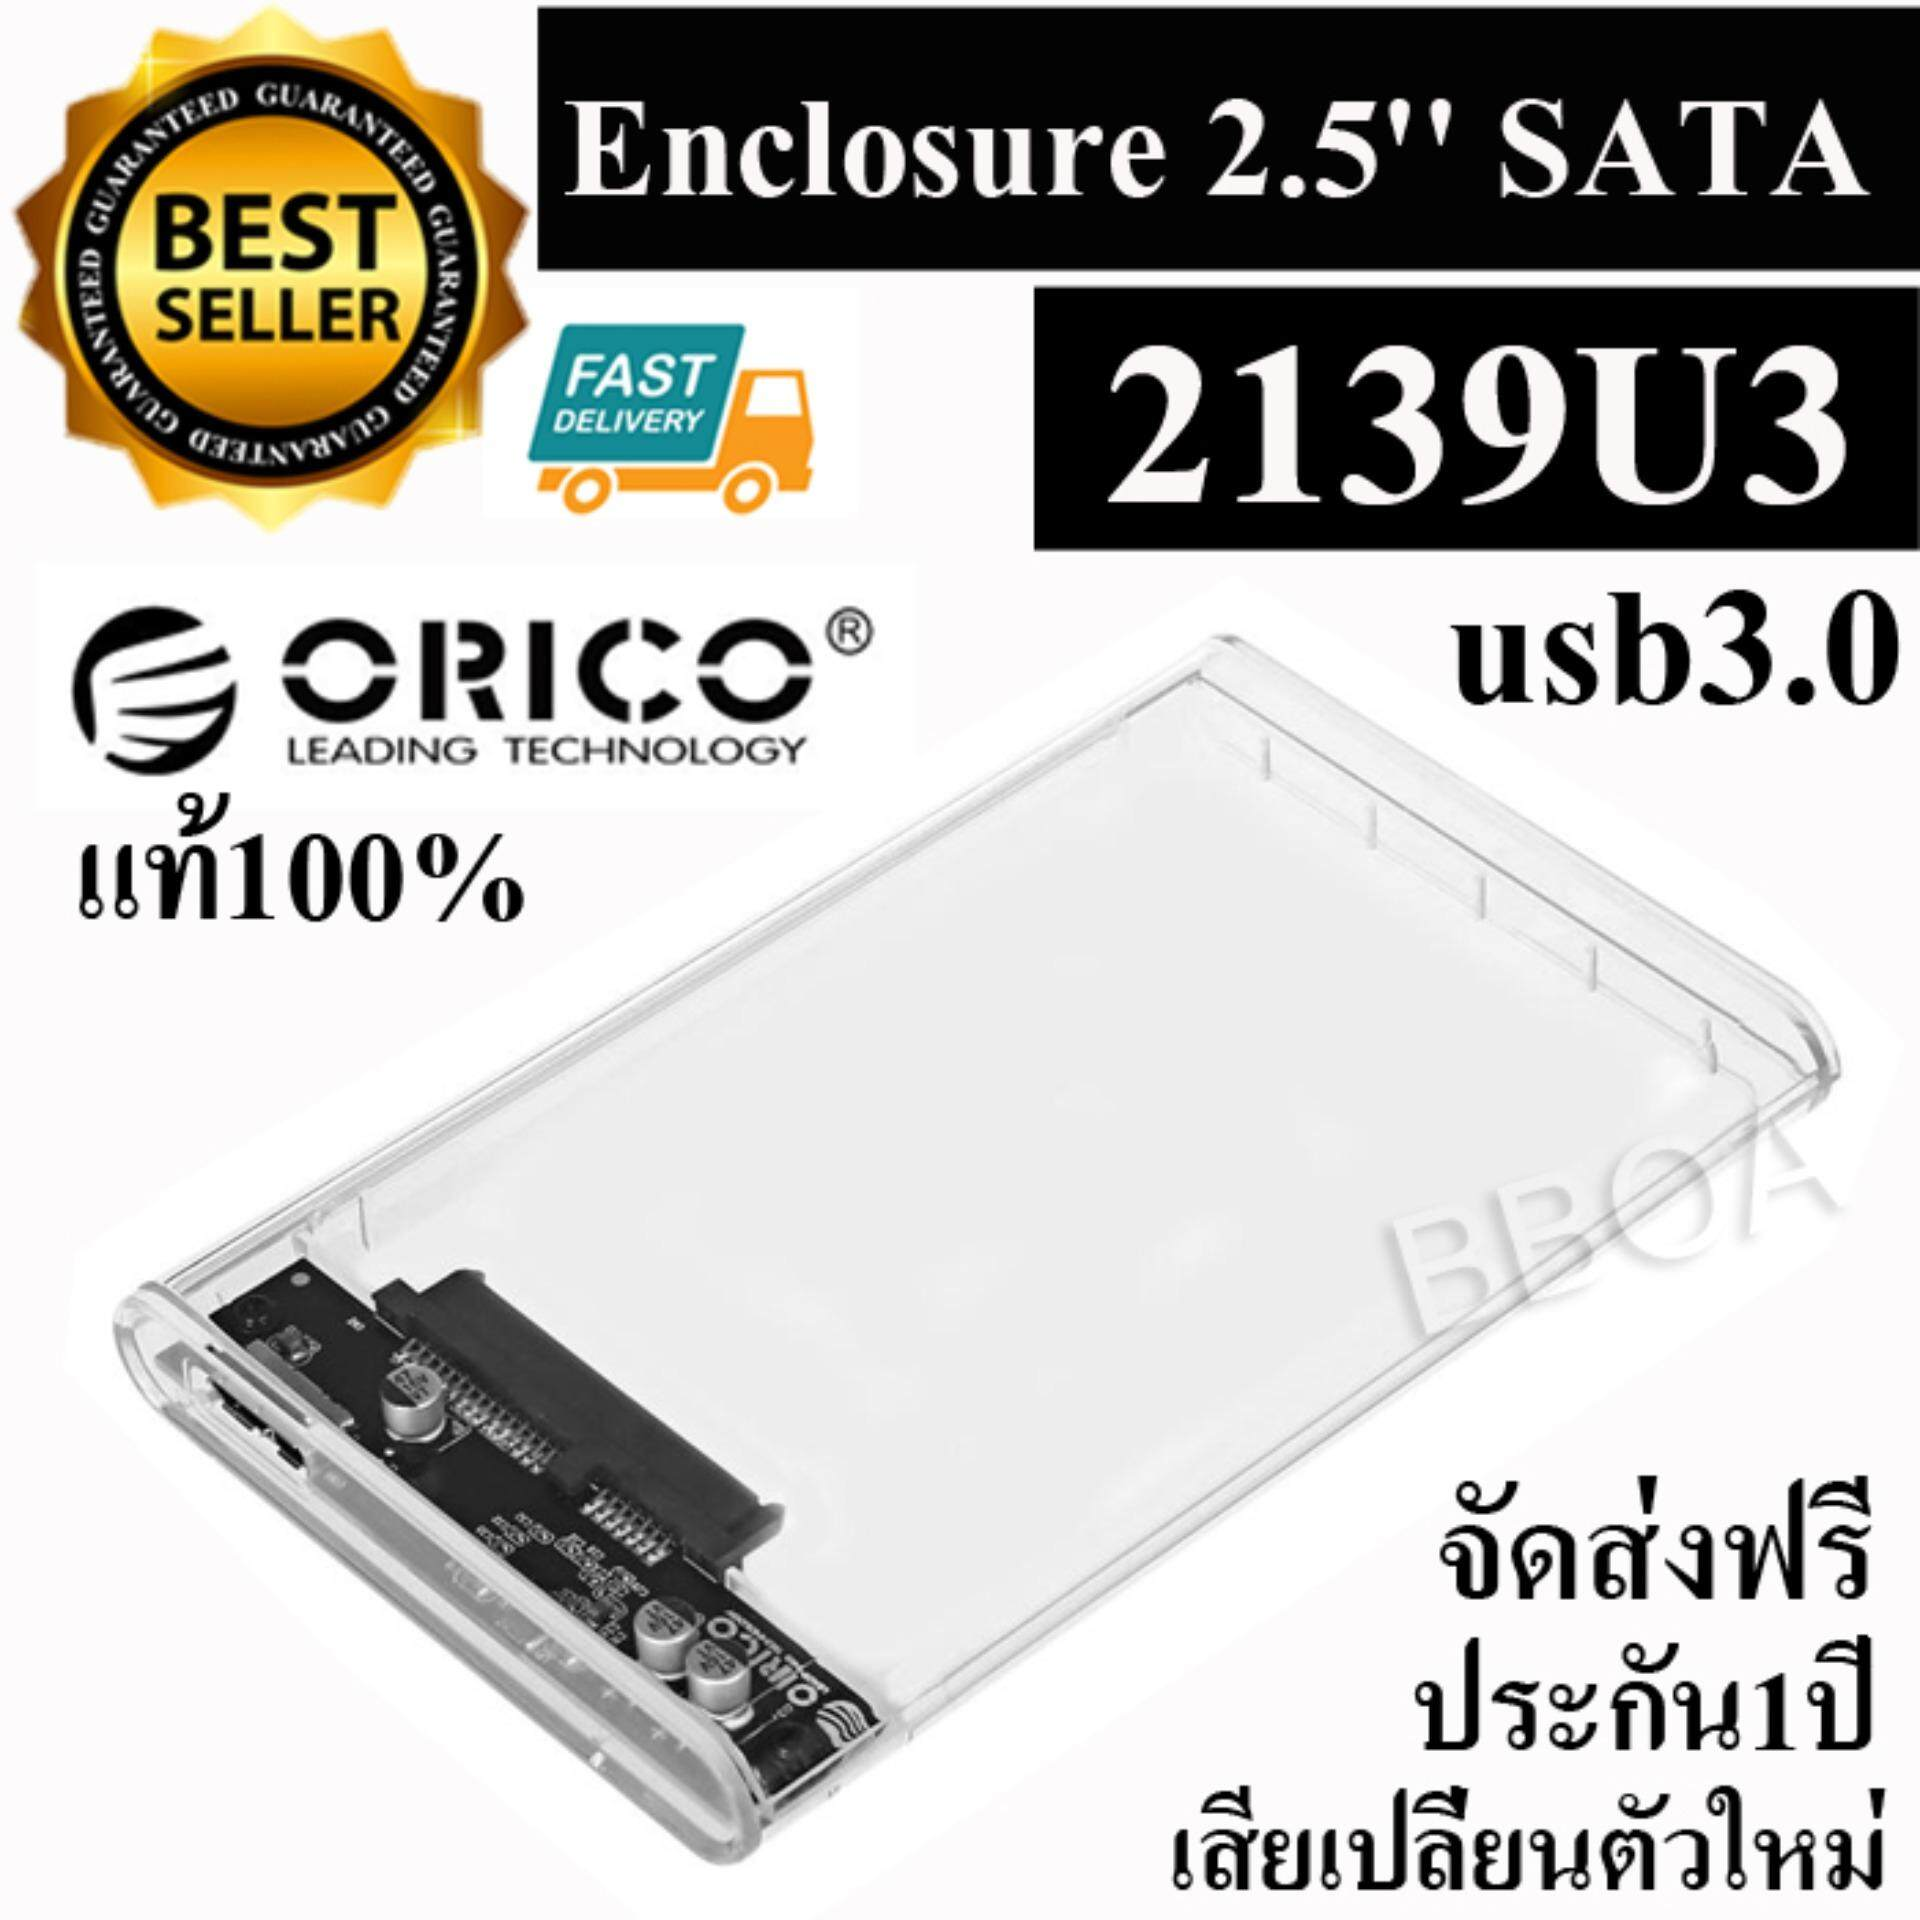 Orico Storage Phi 35 35inch Hdd Protector Blue 2139u3 25 Sata 30 To Usb Hard Drive Disk Box External Enclosure